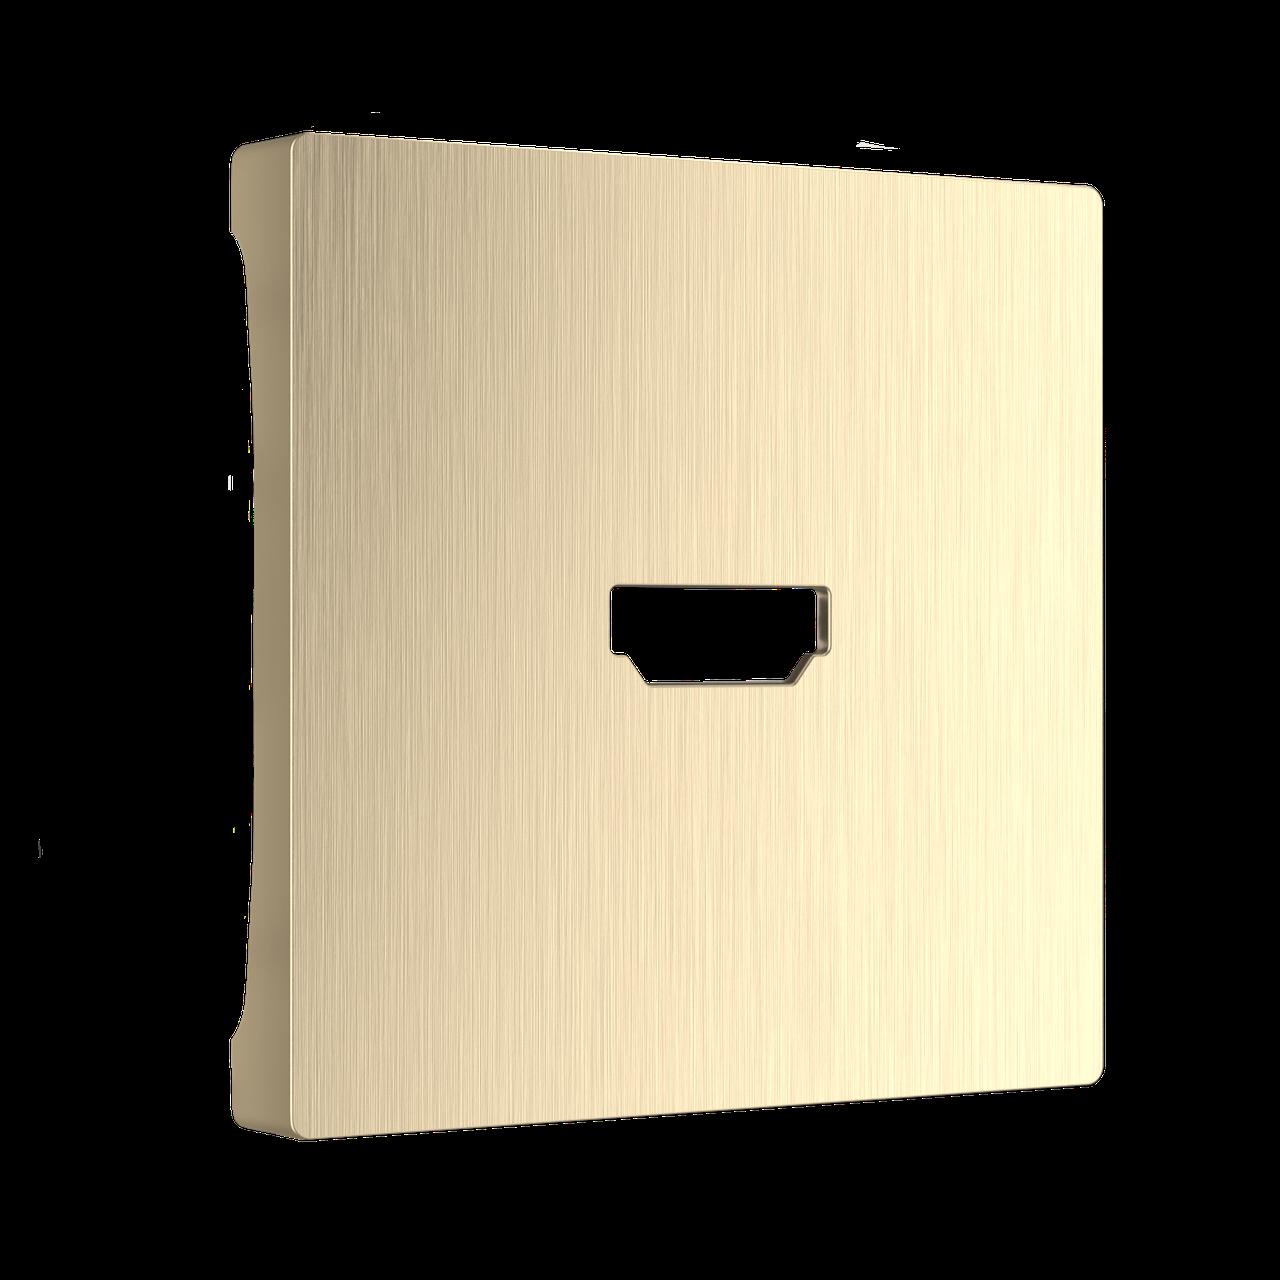 Накладка для розетки HDMI /WL10-HDMI-CP (шампань рифленый)